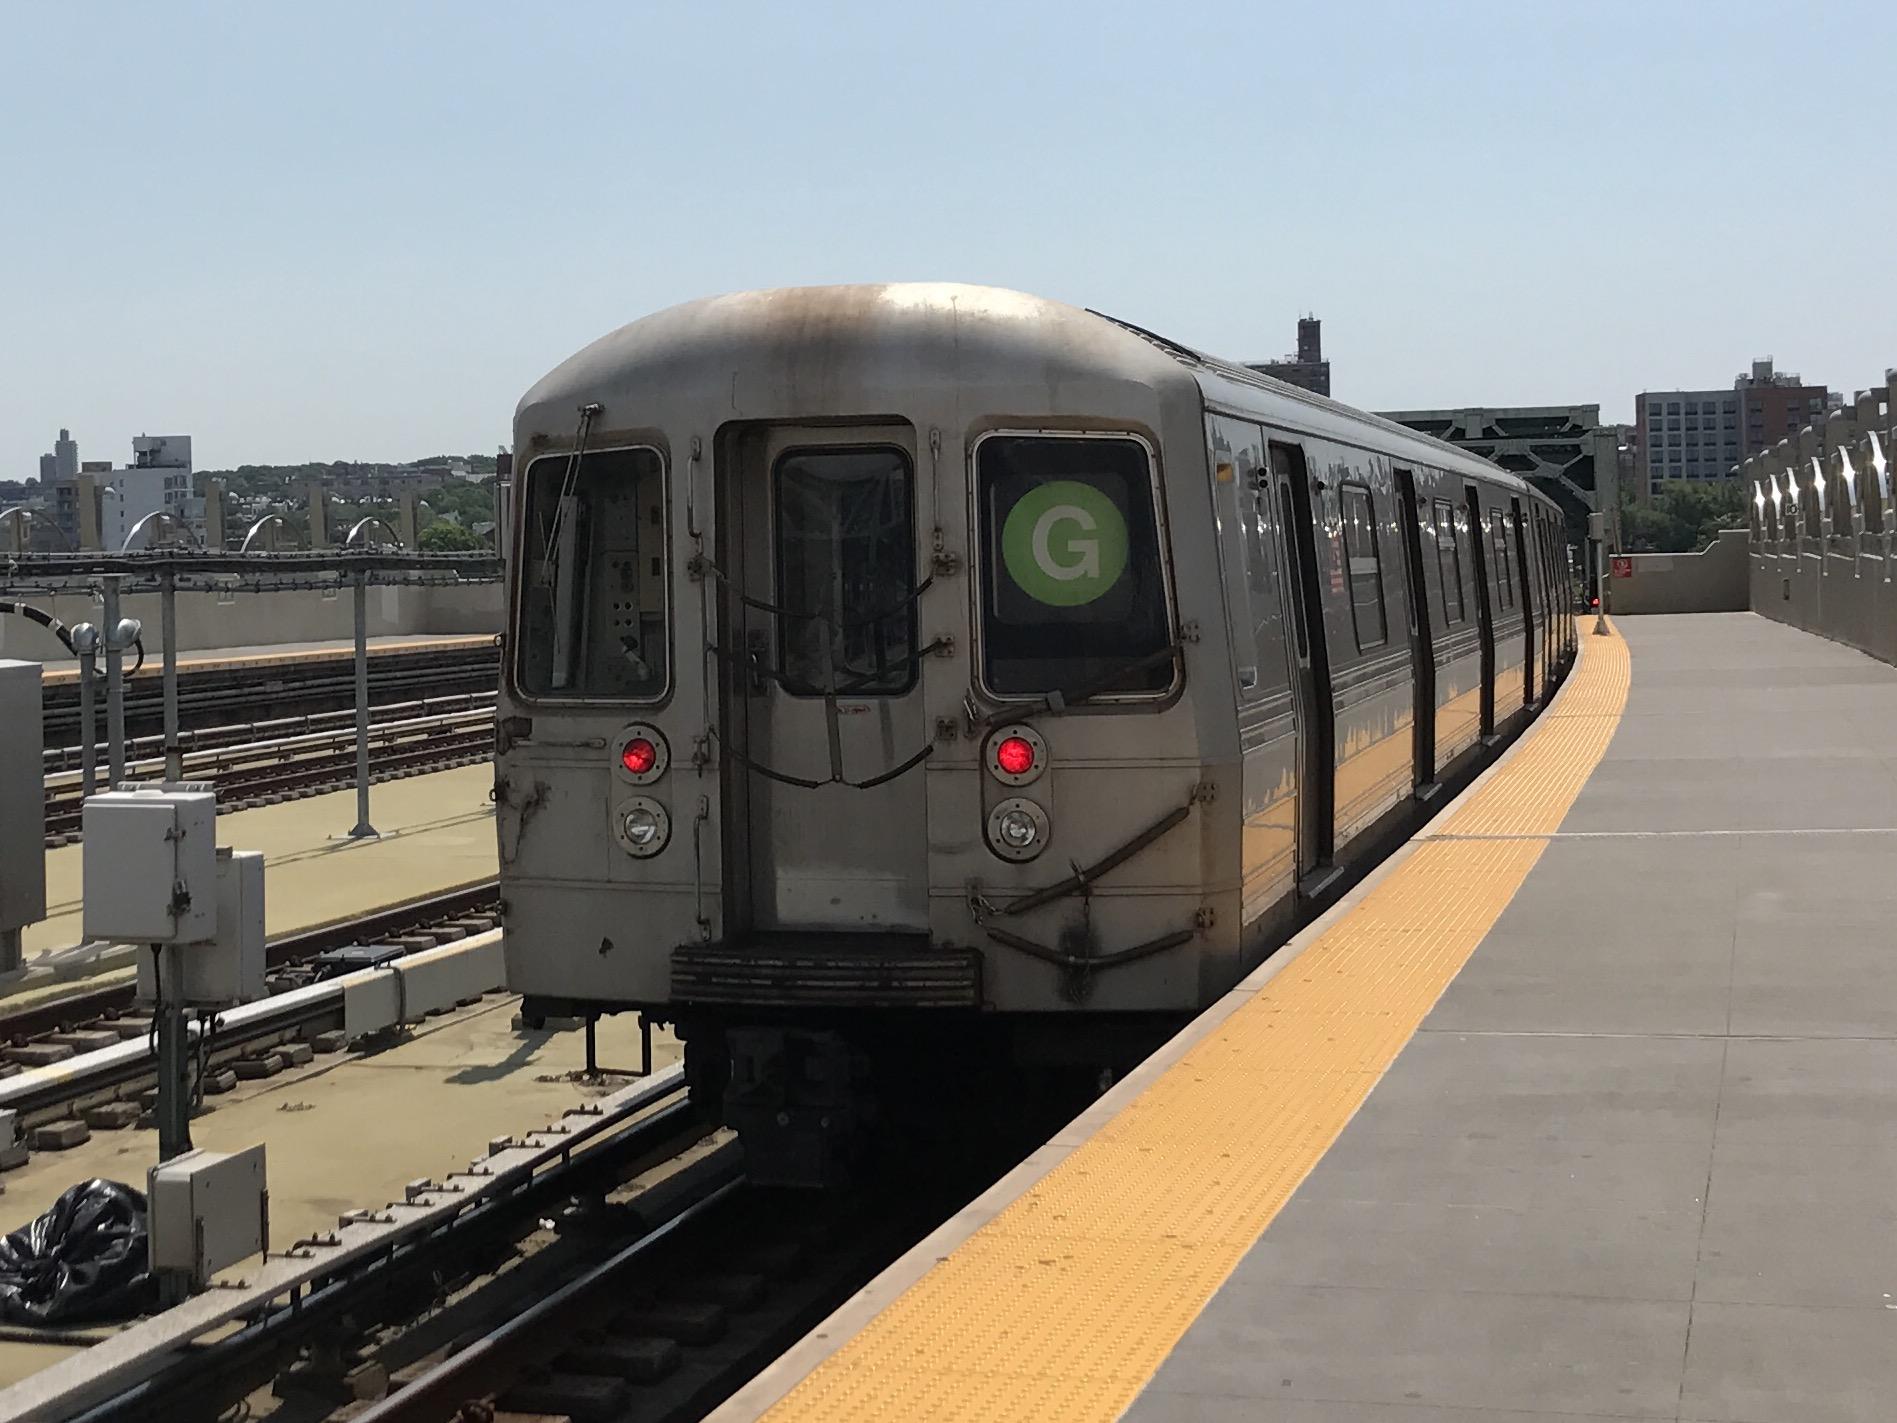 New York Subway Map G Line.G New York City Subway Service Wikipedia